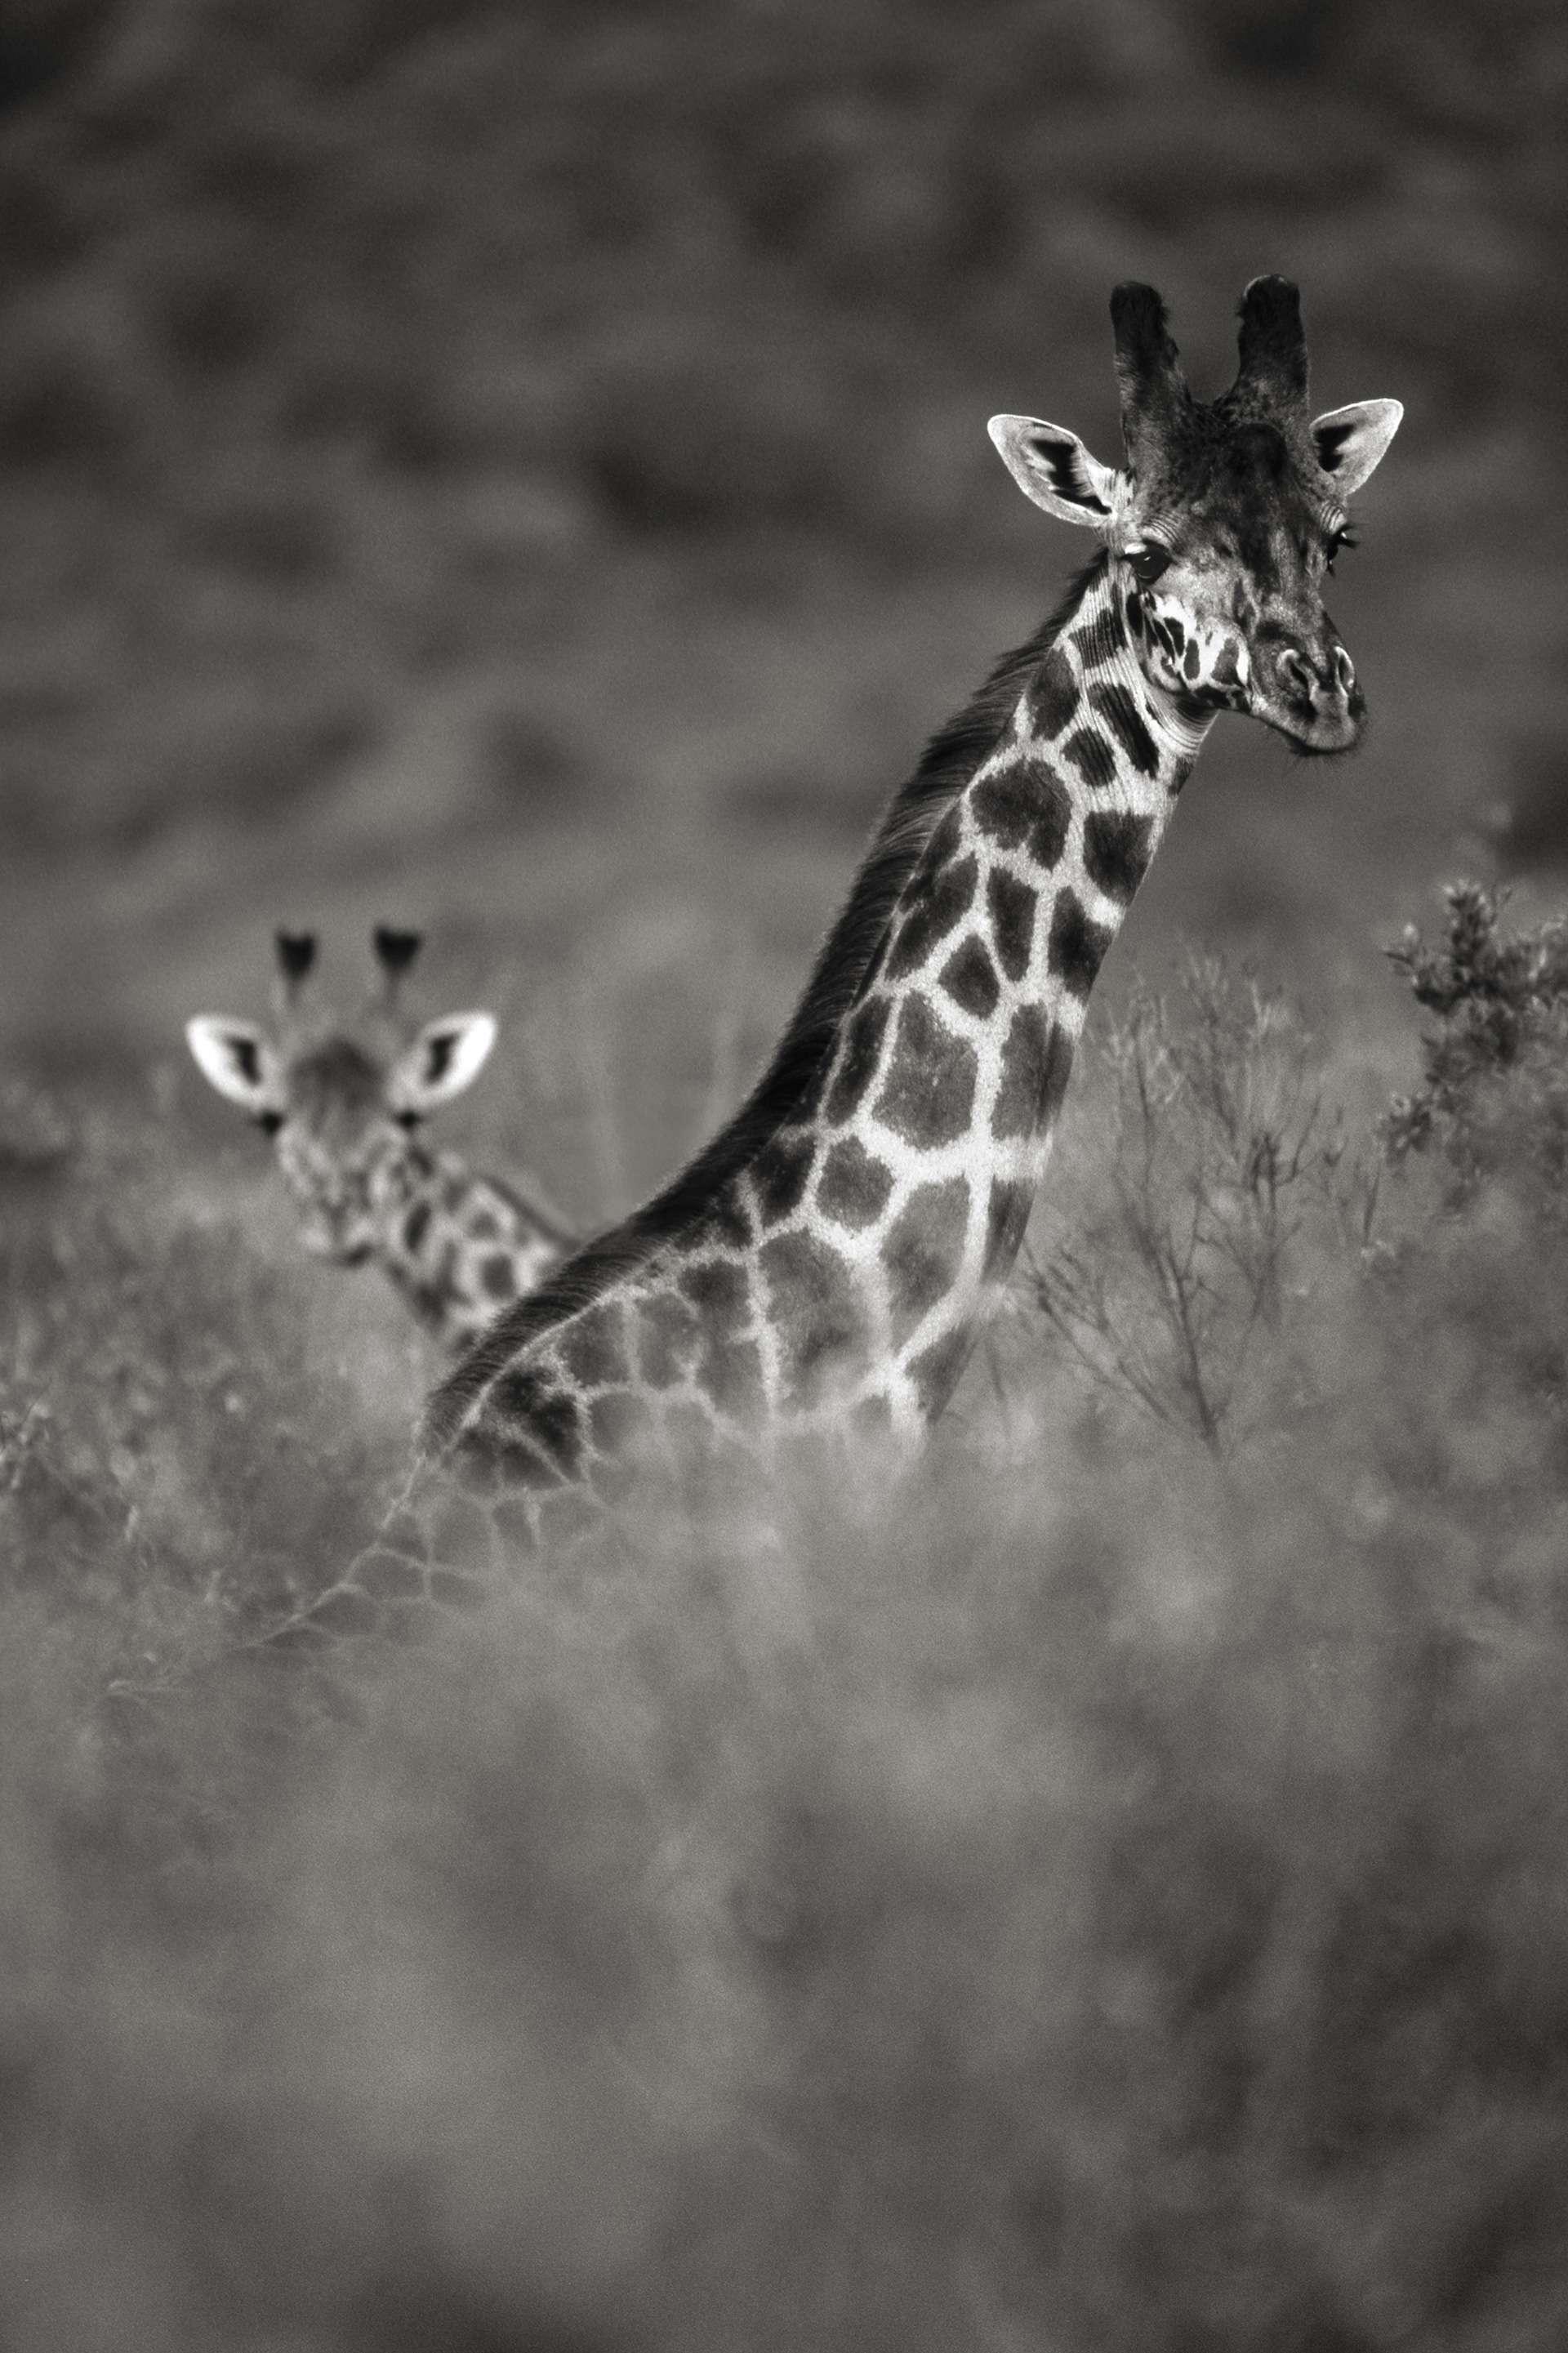 Gilles Martin's photograph : giraffe from Kenya, Struggle for life